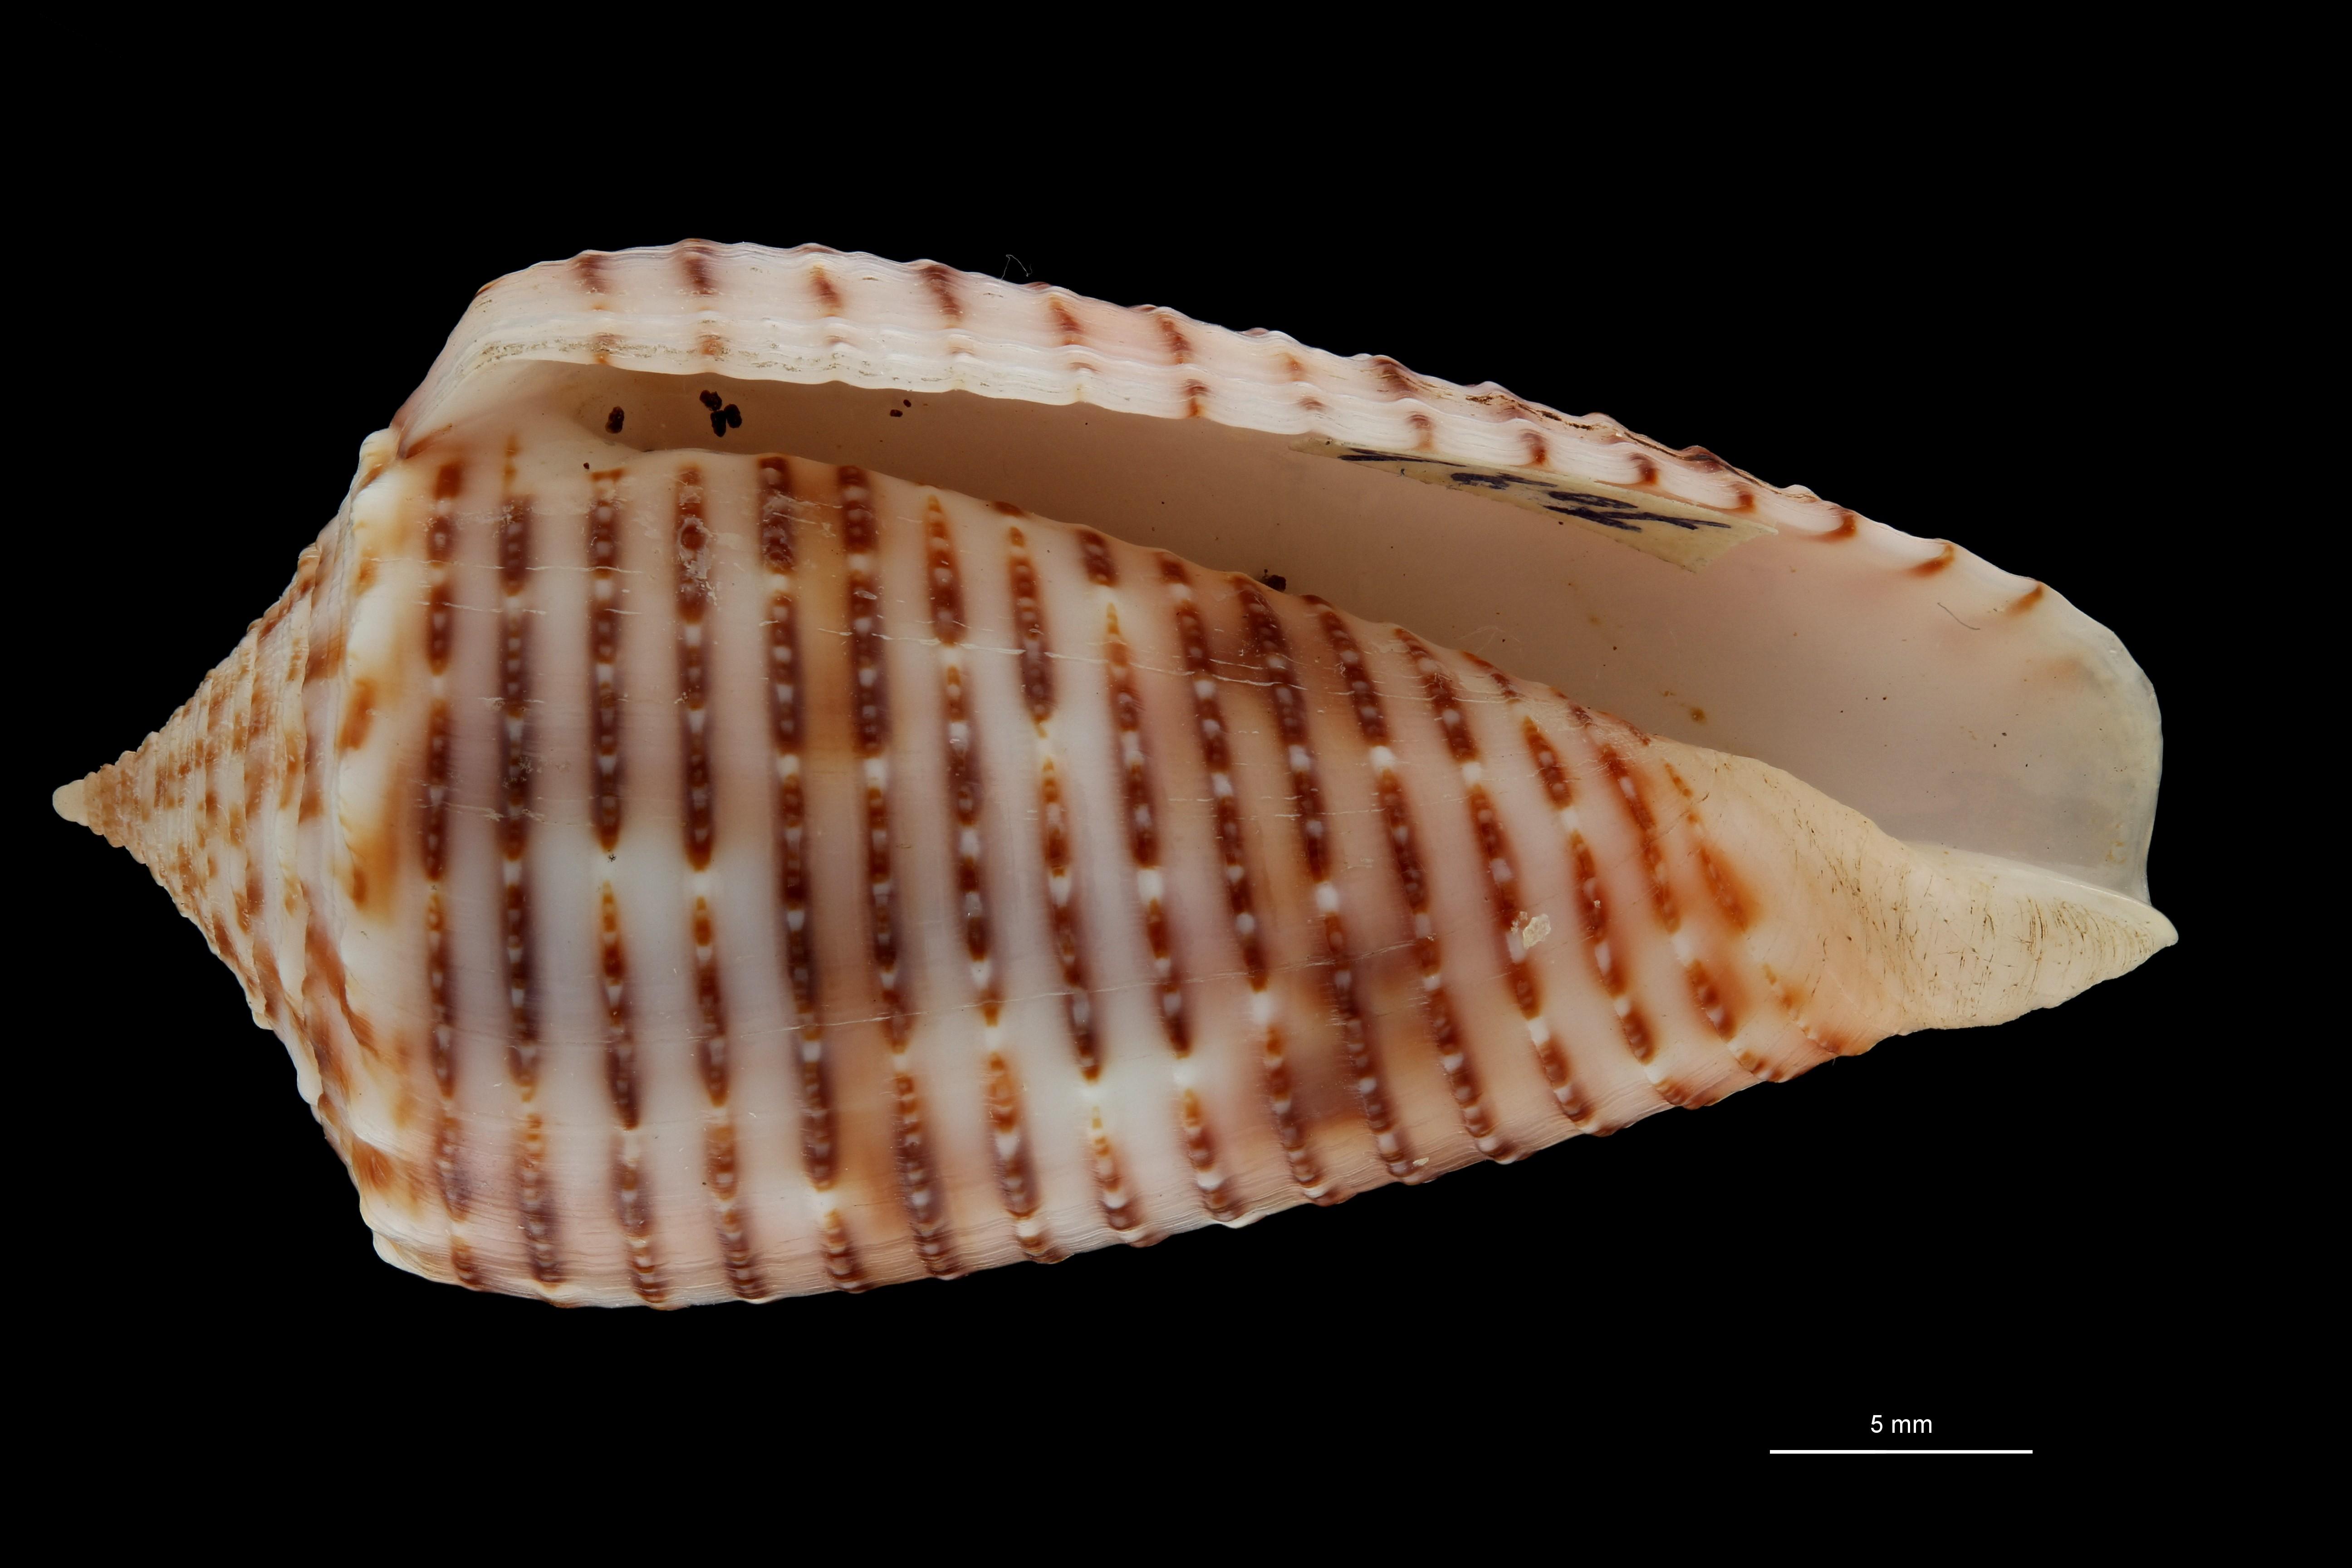 BE-RBINS-INV HOLOTYPE MT 464 Conus (Phasmoconus) proximus cebuensis VENTRAL ZS PMax Scaled.jpg